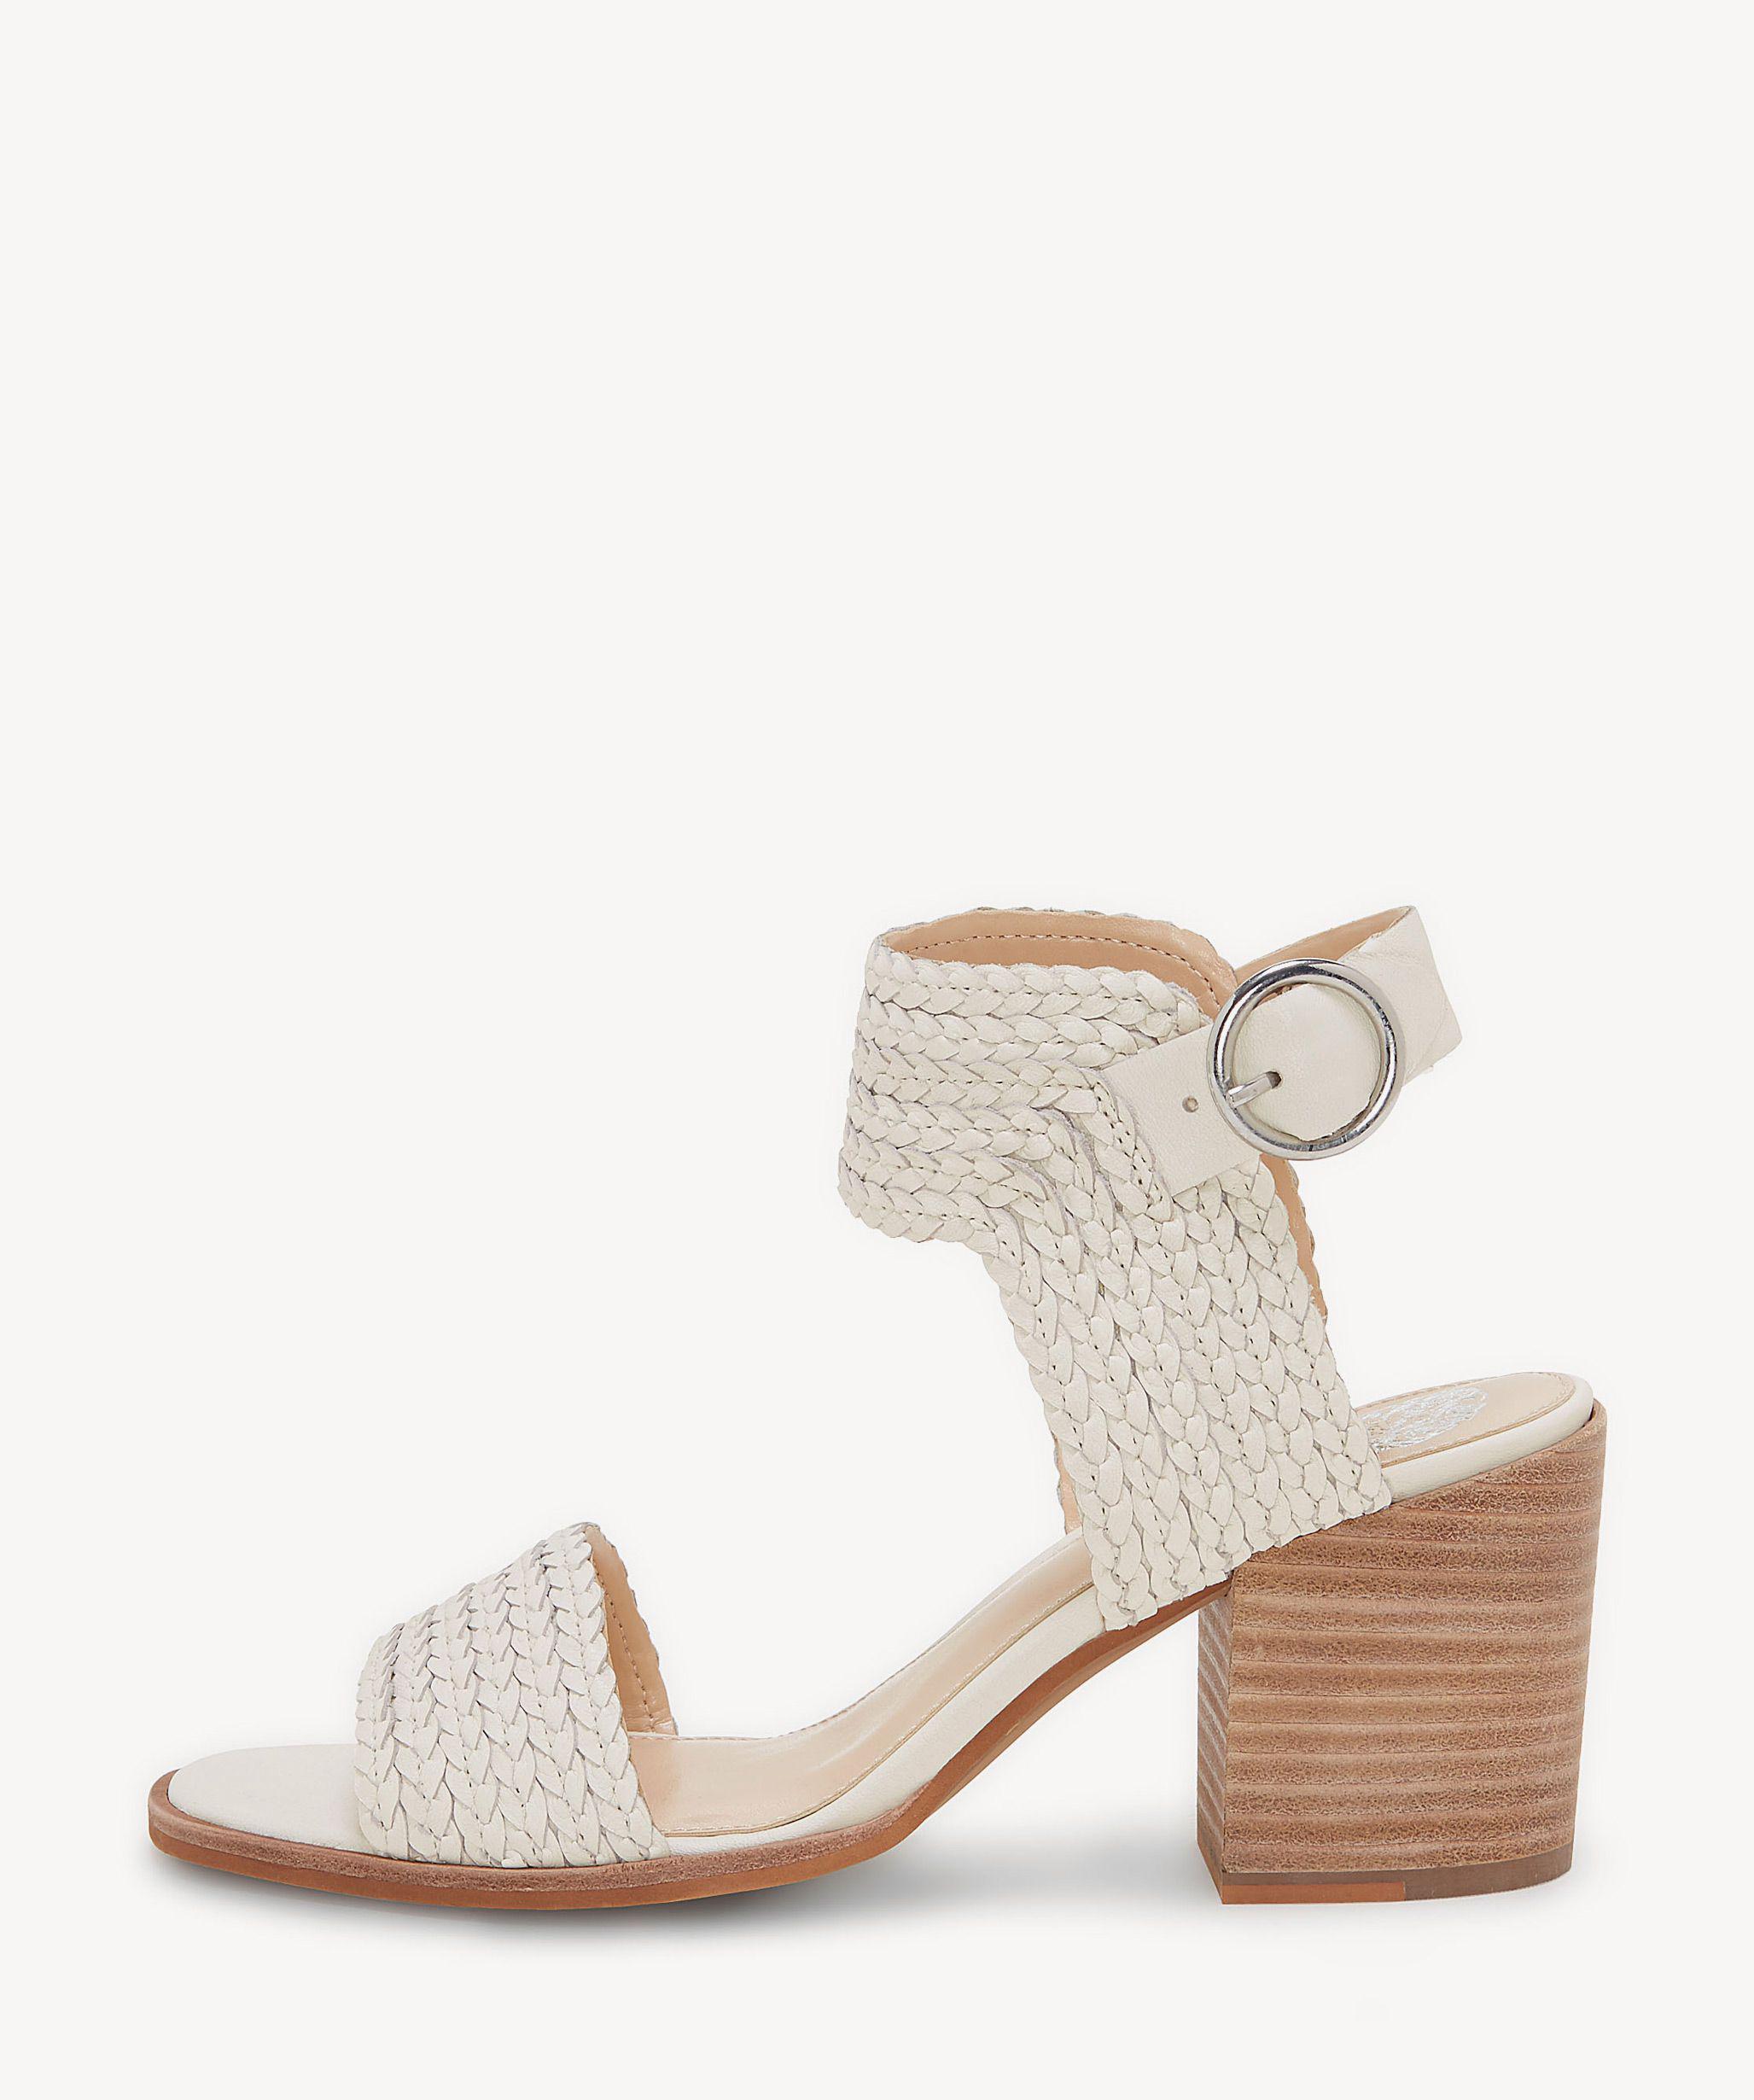 97887c0c17a Lyst - Vince Camuto Kolema Block Heel Sandal in Natural